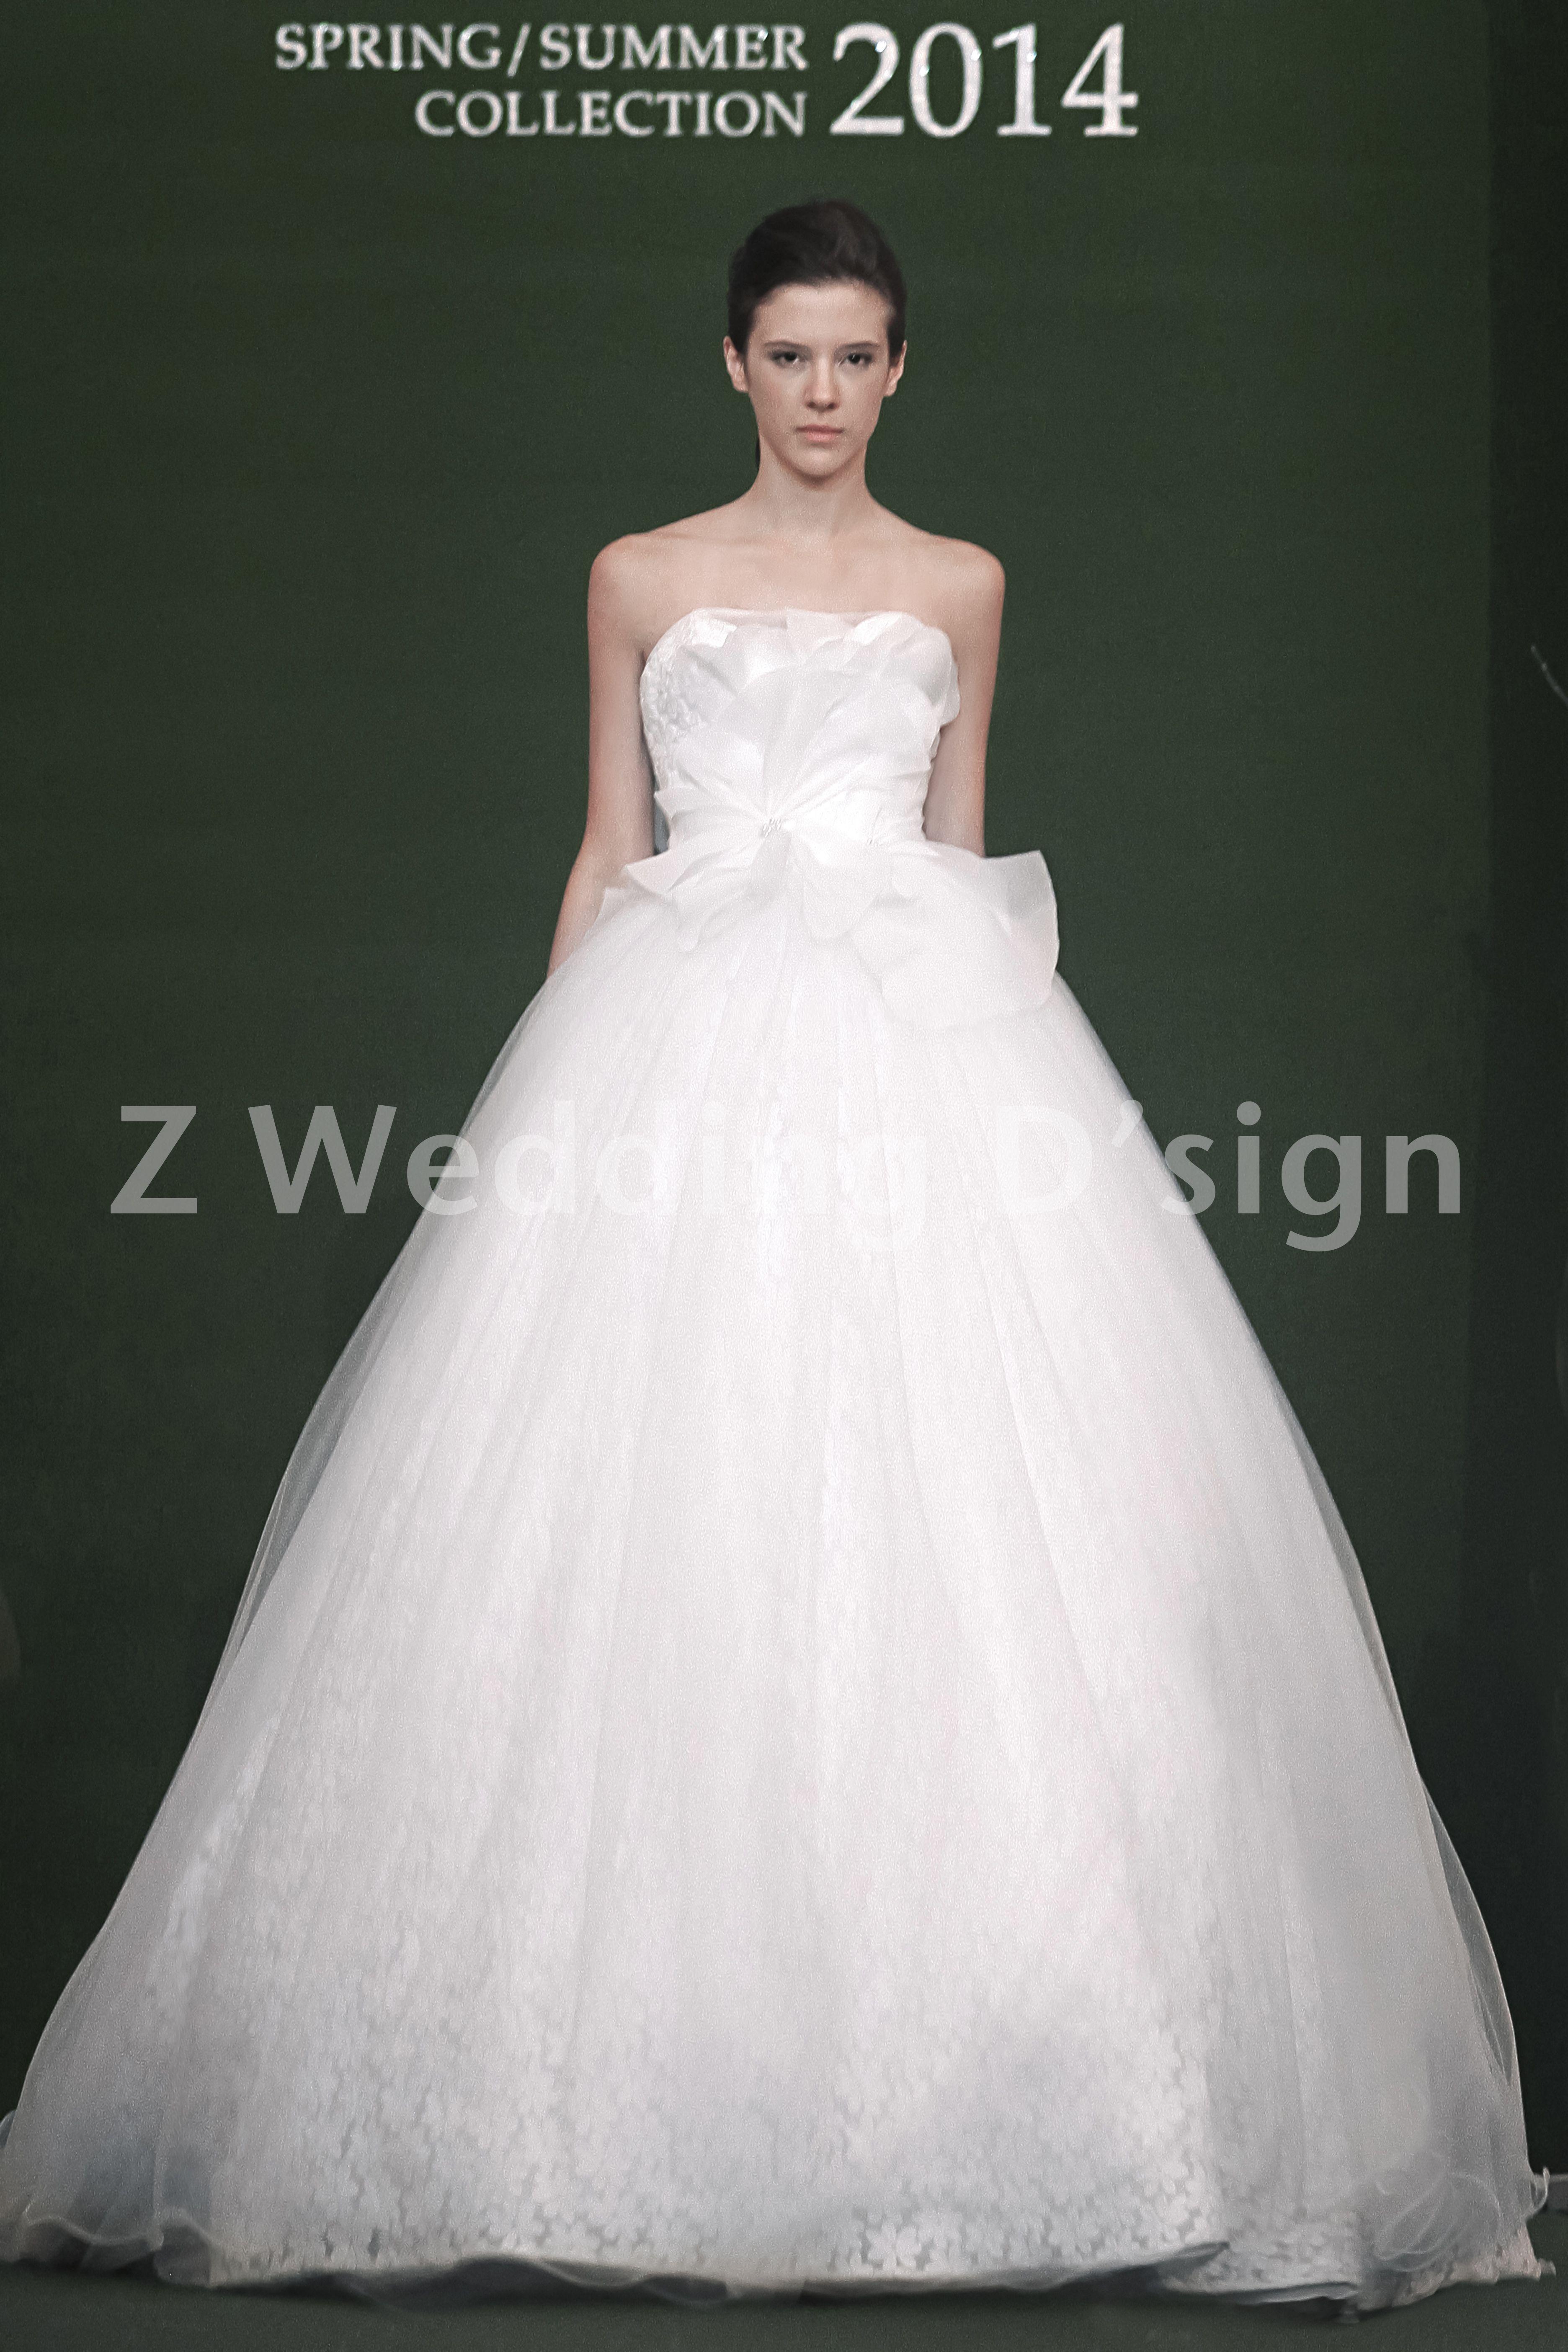 Jan 2014 - Z Wedding Bridal Runway #zwedding #bridalfashion #fashionrunway #runway #bridalrunway #fashionshow #bridalshowsg #bridalshow #bridalsg #weddingsg #wedding #chrisling #chrislingphotography #weddinggown #weddinggowns #gowns